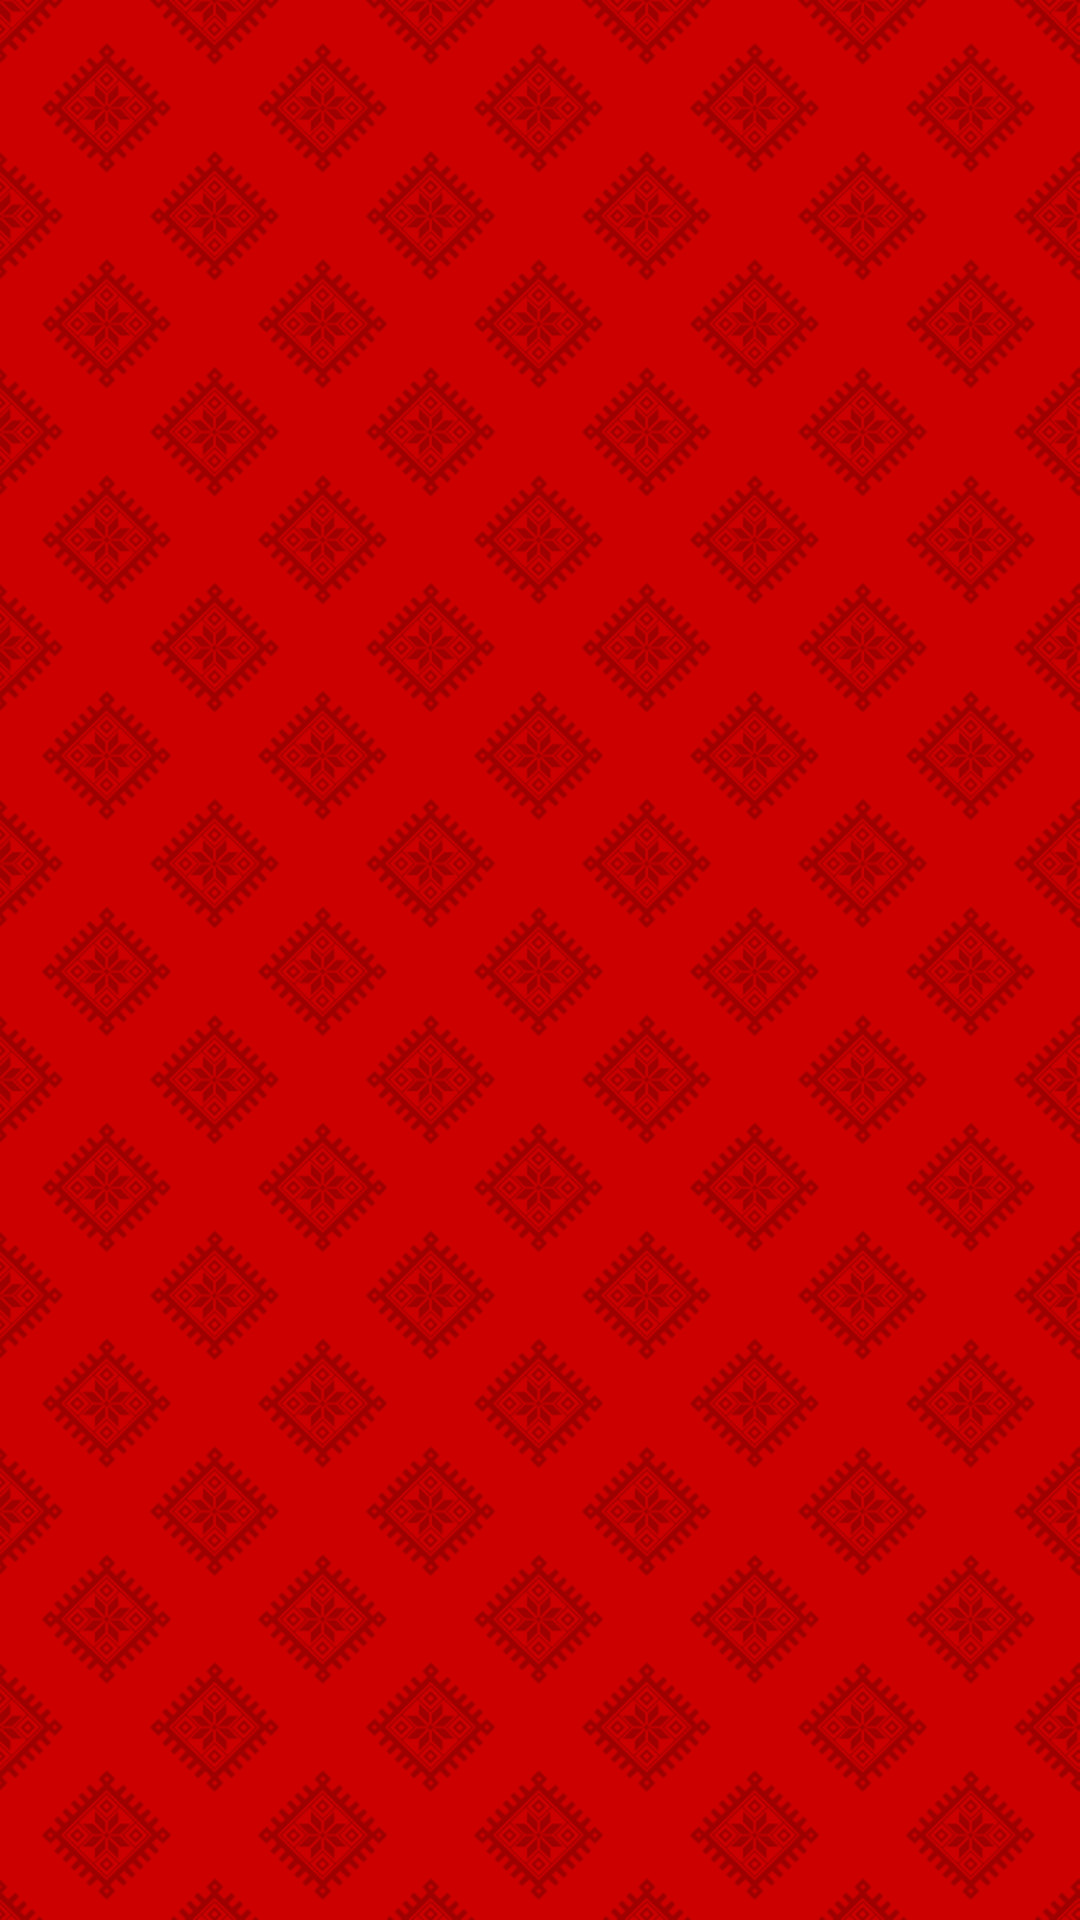 Art Creative Red Pattern Grid Structure HD. App WallpaperWallpaper  BackgroundsRed PatternIphone 6